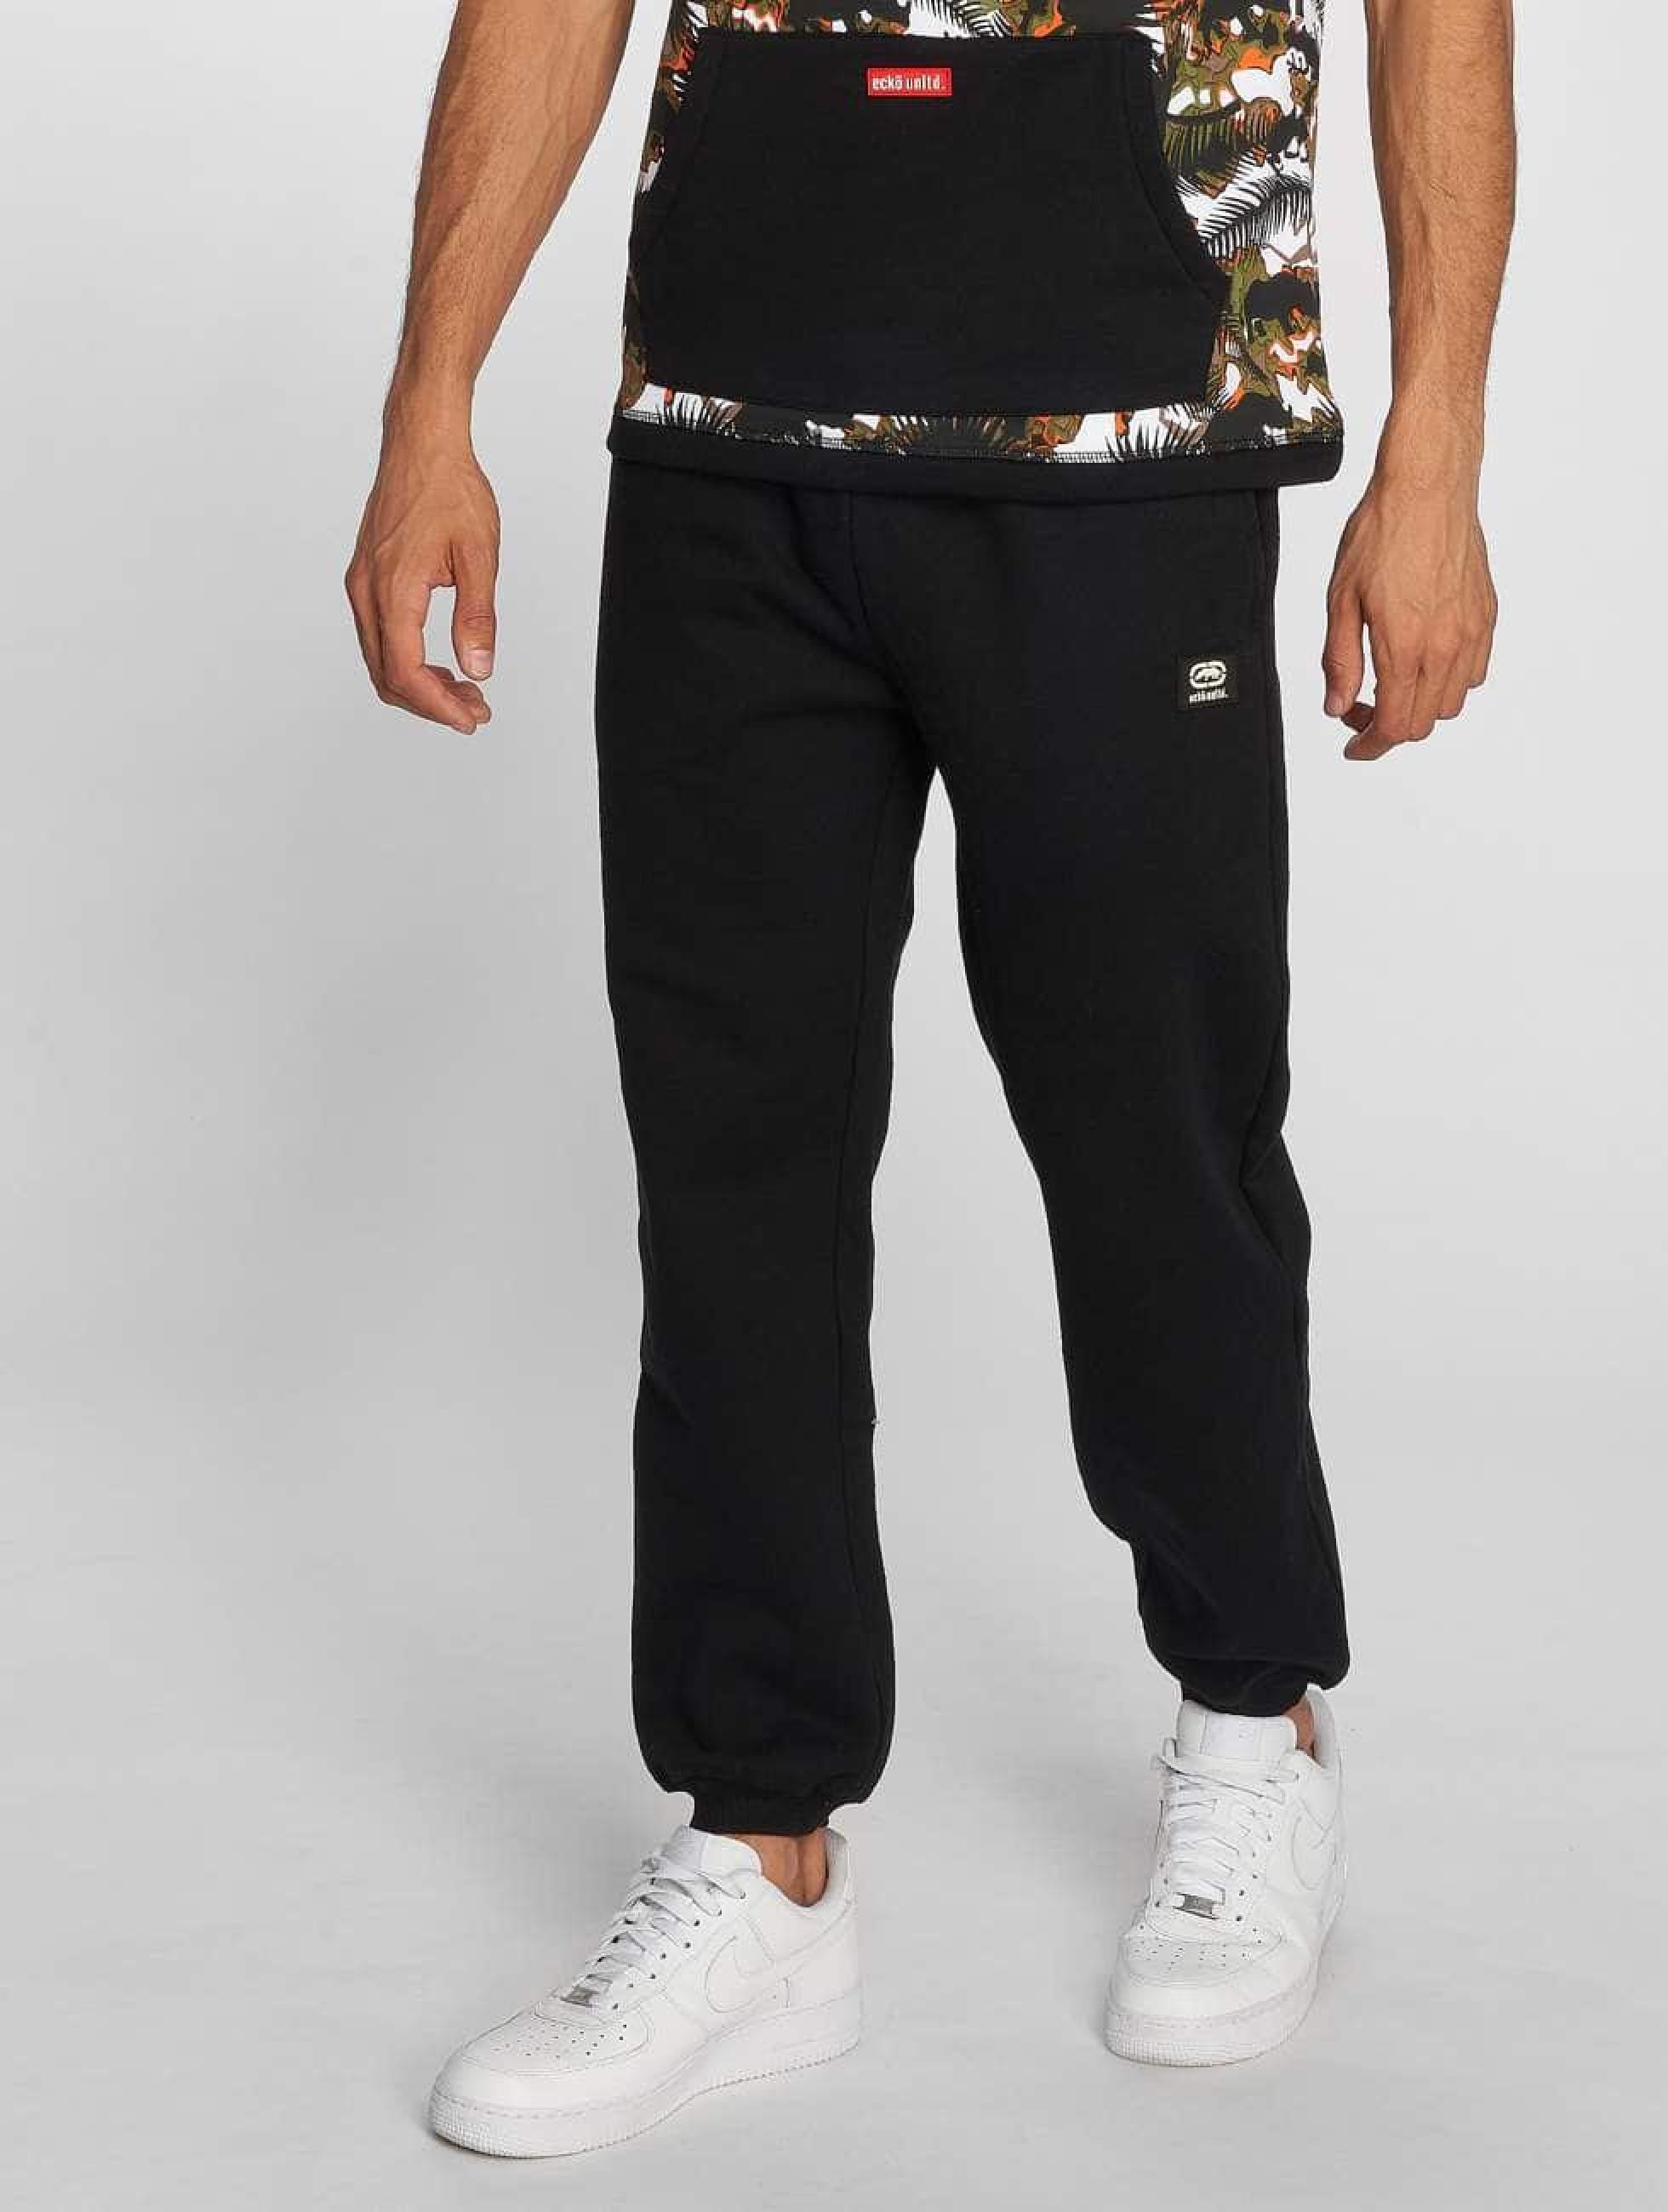 Ecko Unltd. / Sweat Pant SkeletonCoast in black 5XL